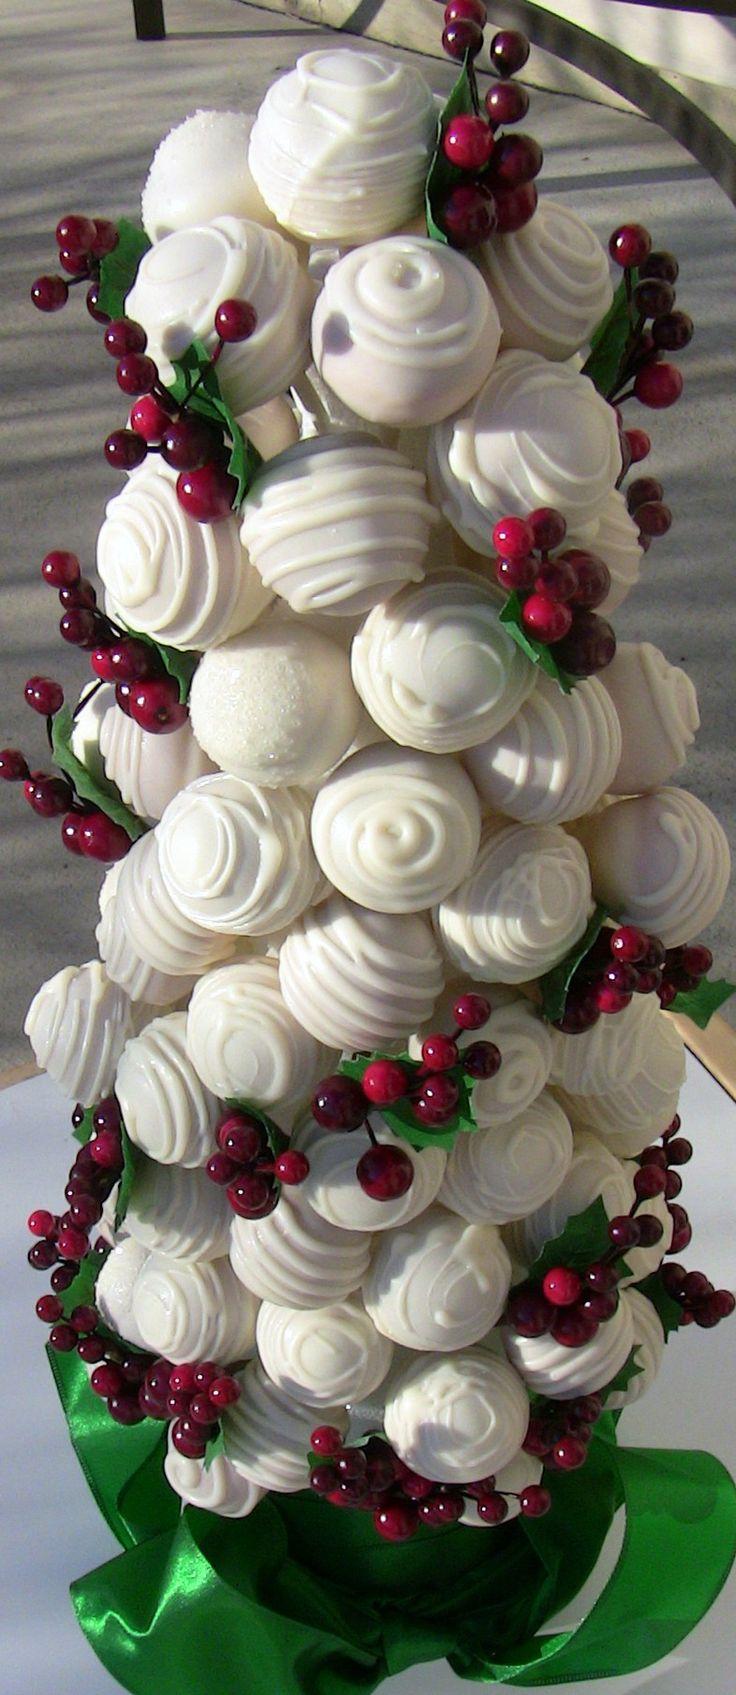 wedding cake pops wedding cake pops 25 Best Ideas about Wedding Cake Pops on Pinterest Cake pop favors Cake pop wedding favours and Cakepops